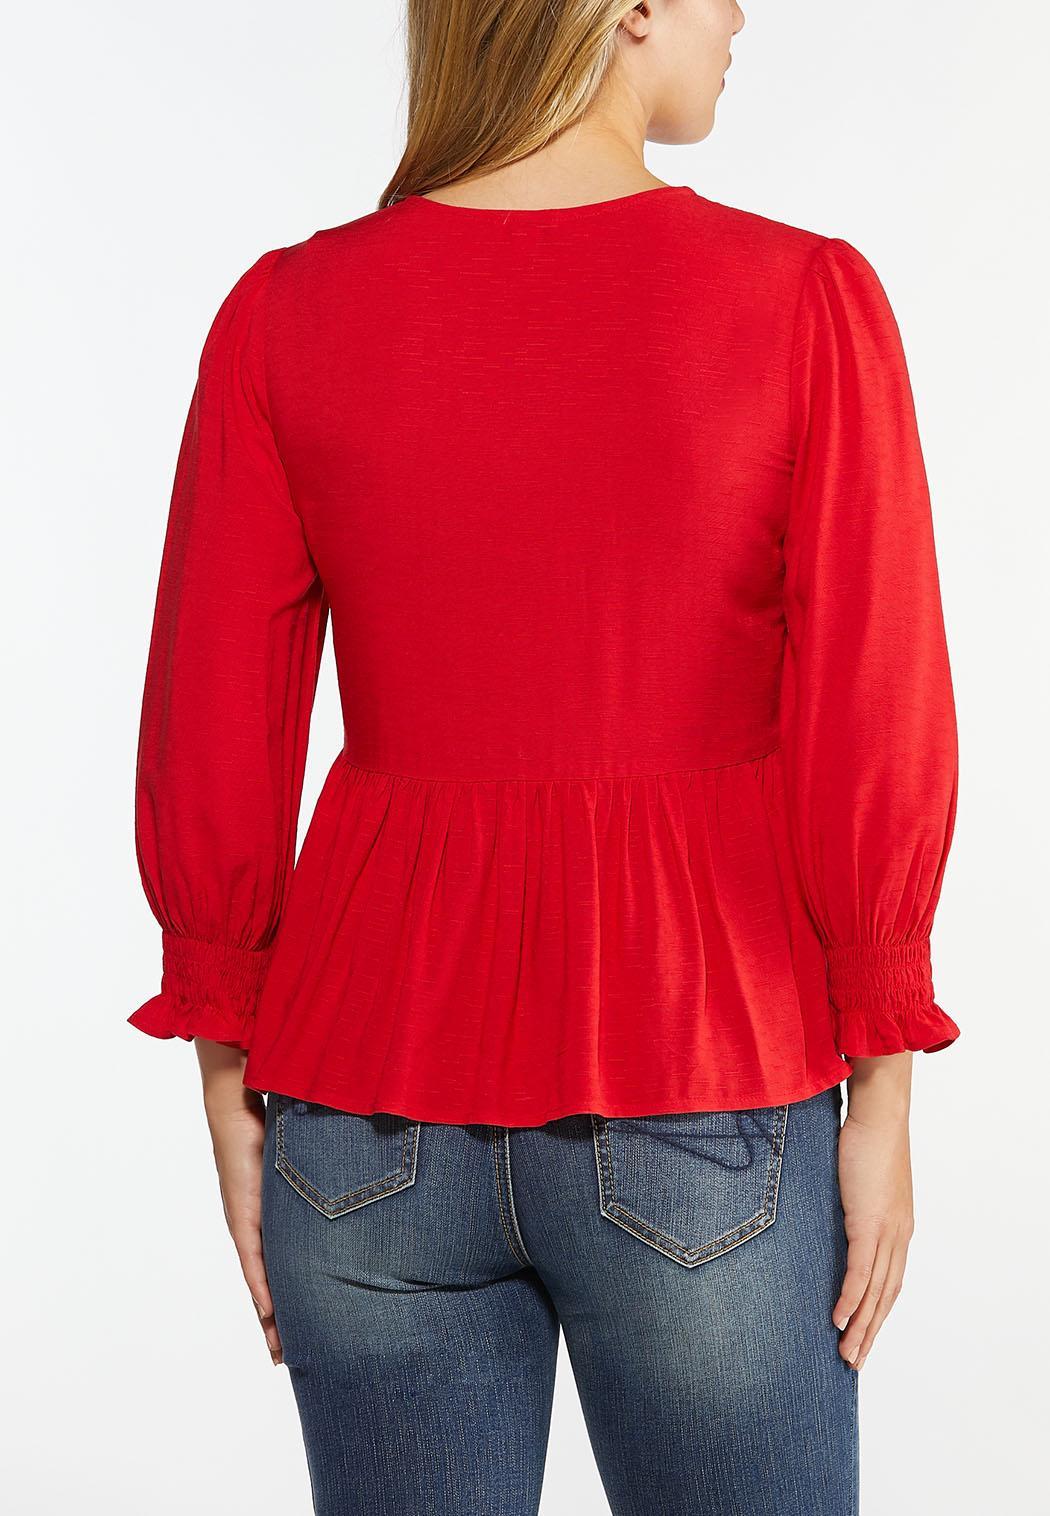 Red Smocked Peplum Top (Item #44446813)